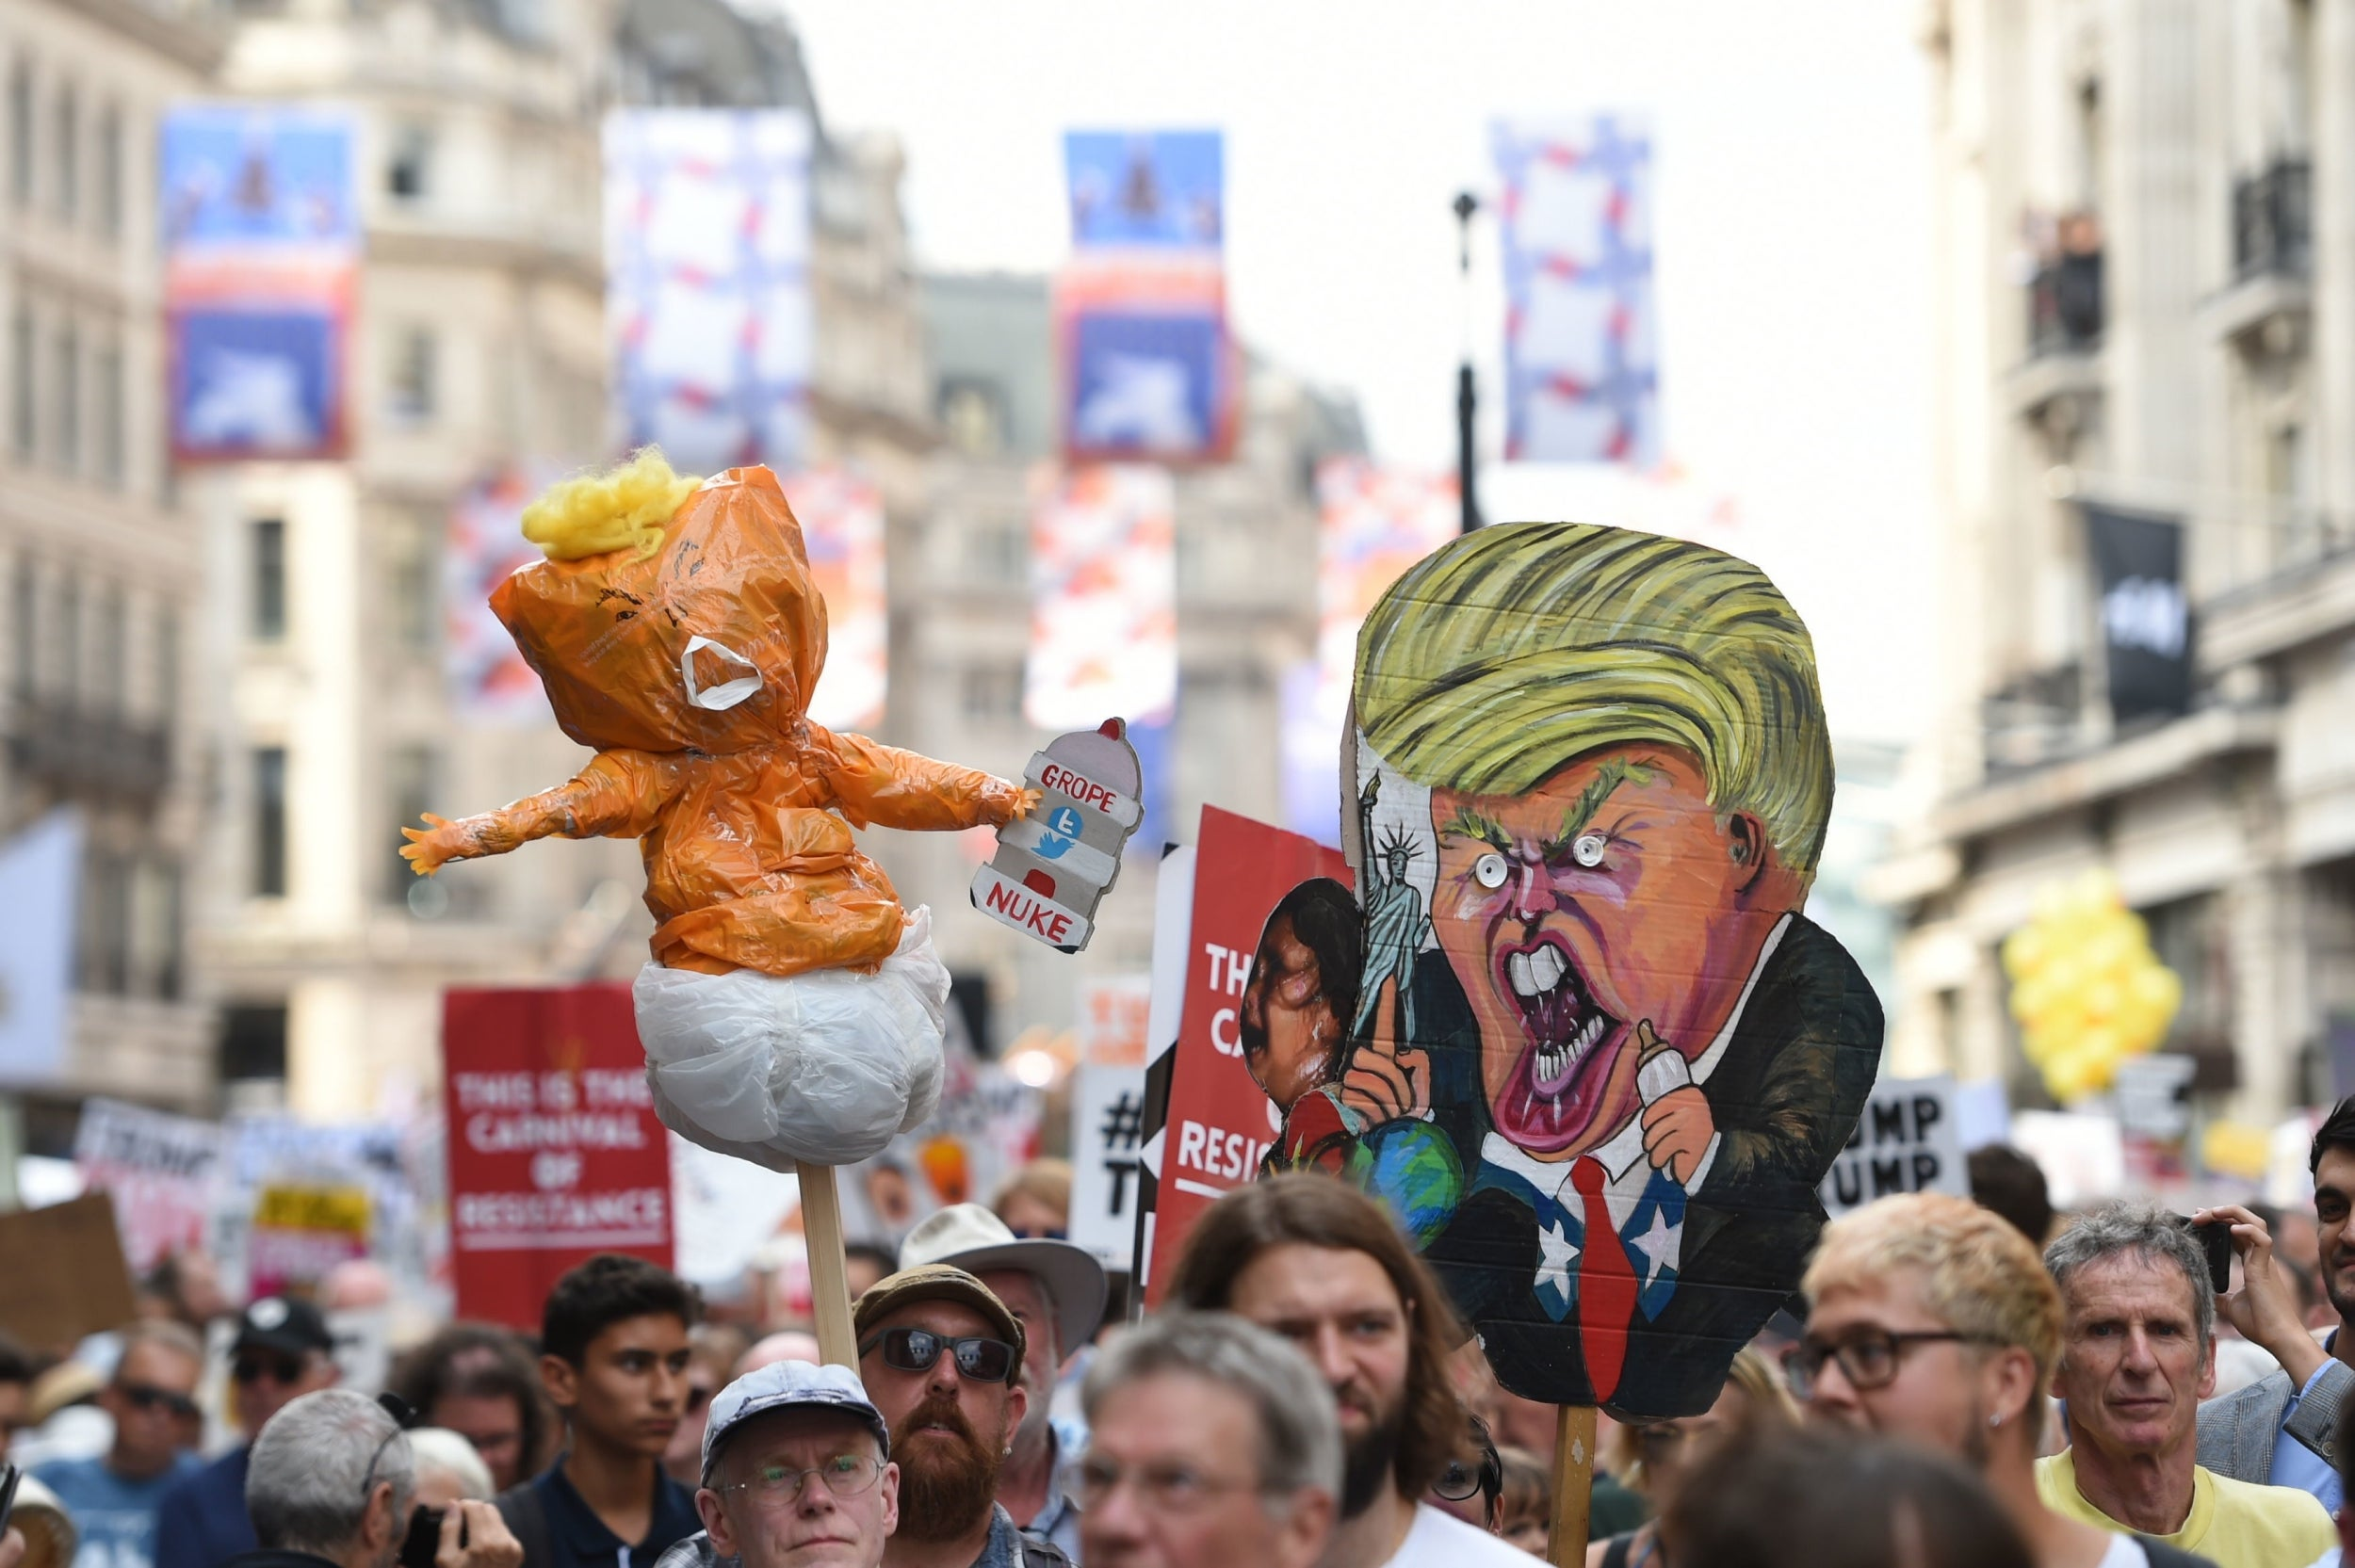 Bear fuck protest